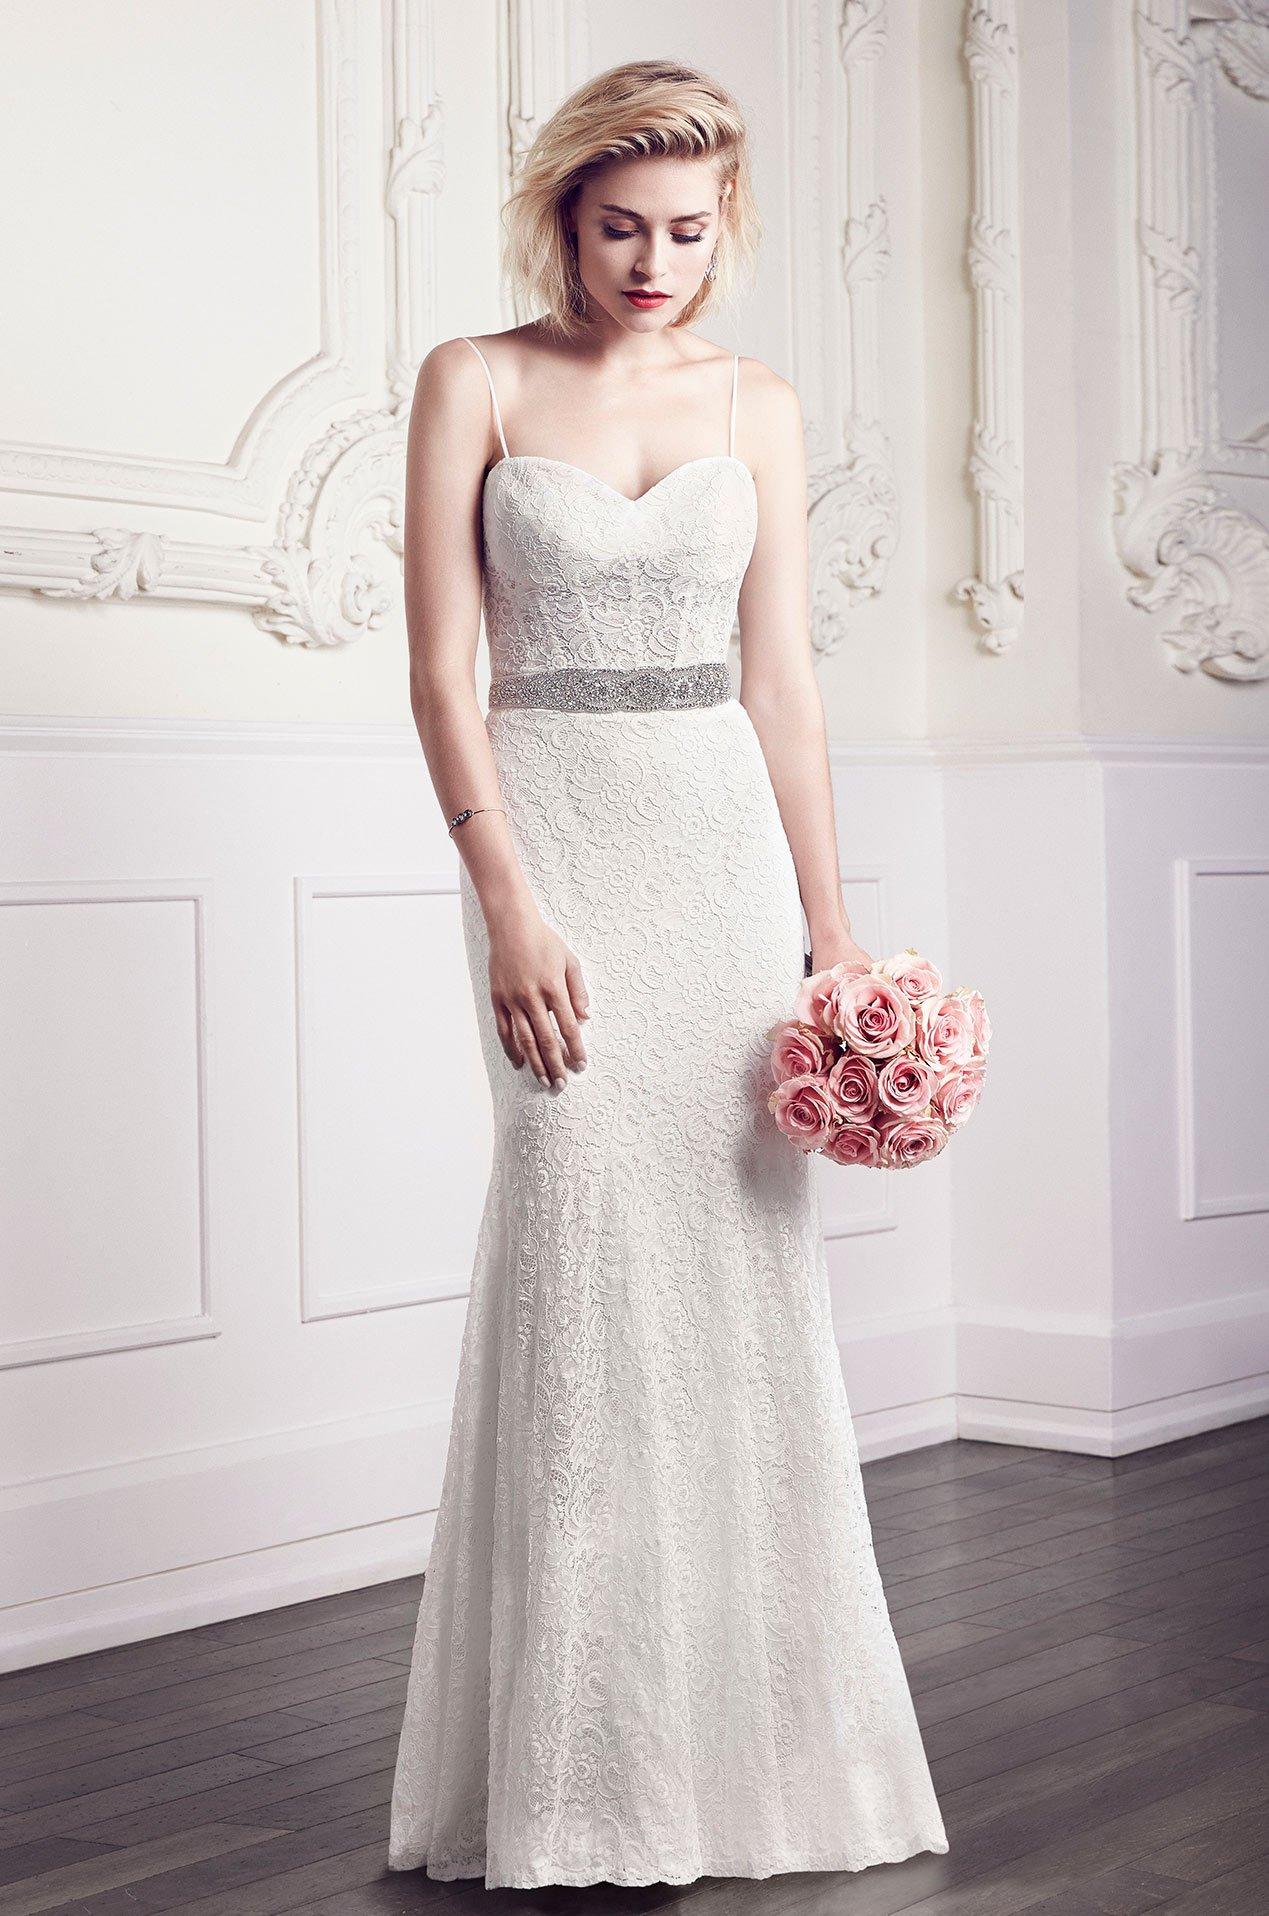 Dress Of The Week: Mikaella Style 1952   Mikaella Bridal